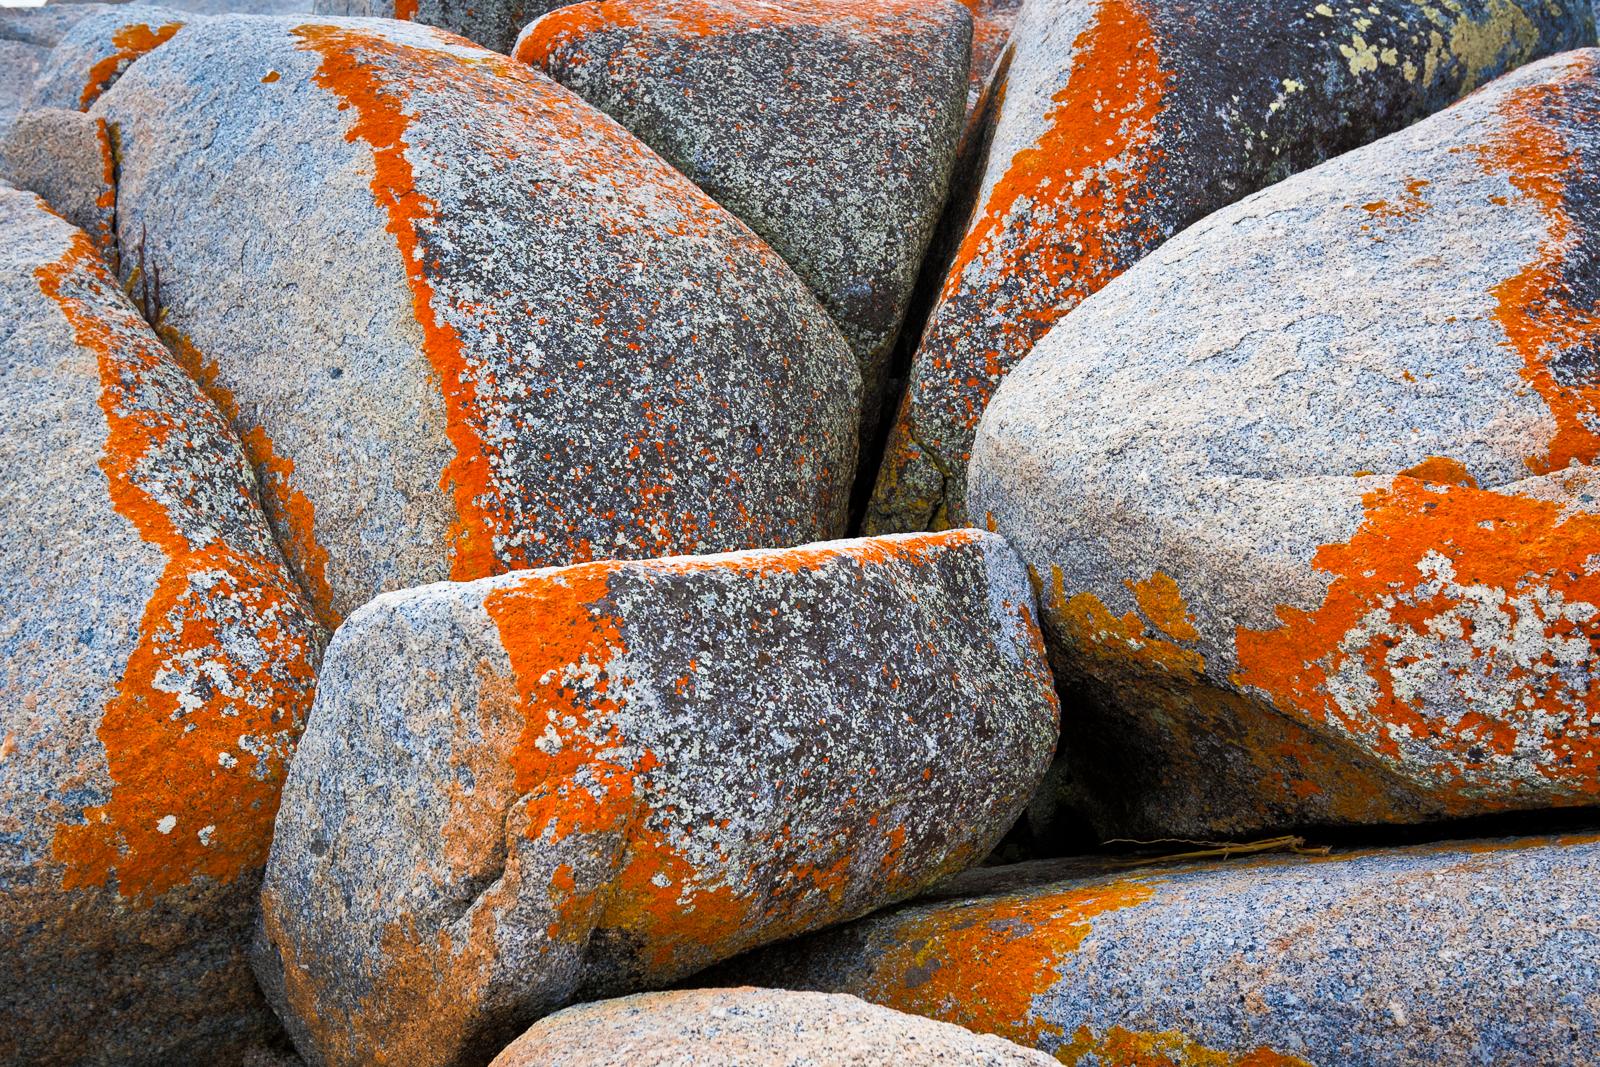 Boulders at Bay of Fires, Tasmania